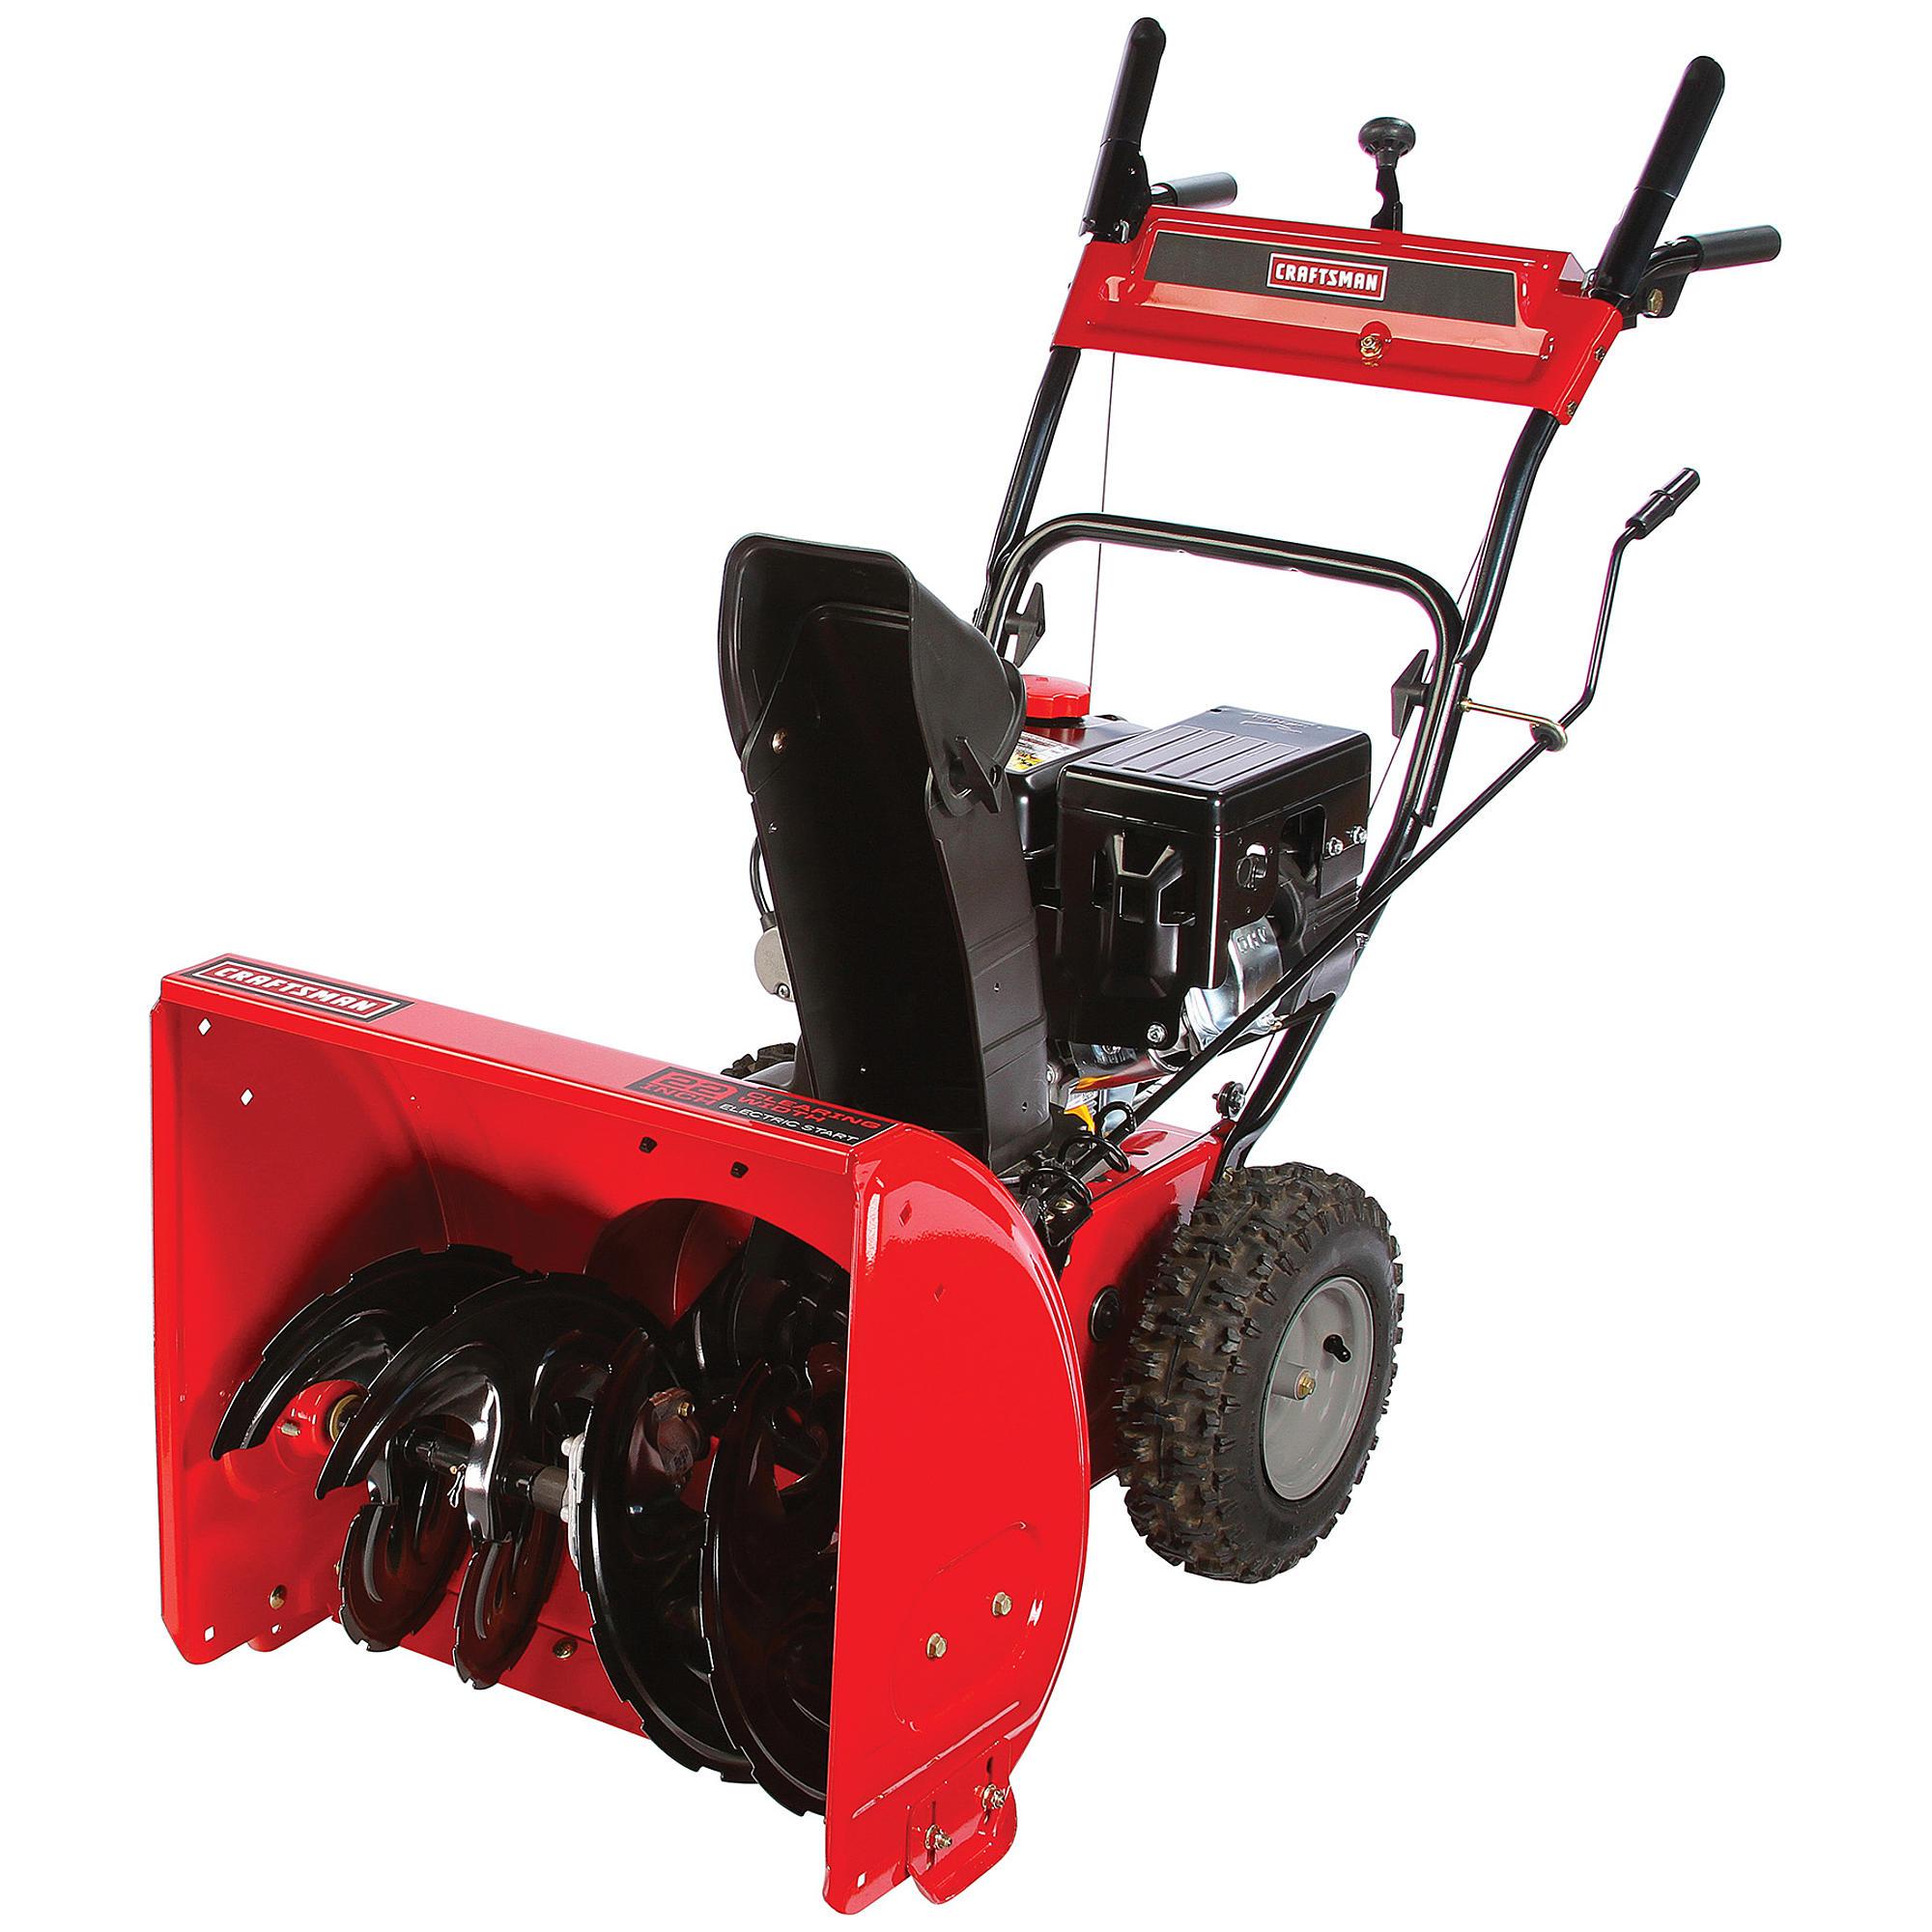 Craftsman 88433 22 inch 179cc Dual-Stage Gas Snowblower $399 (BlackFriday Price now!)